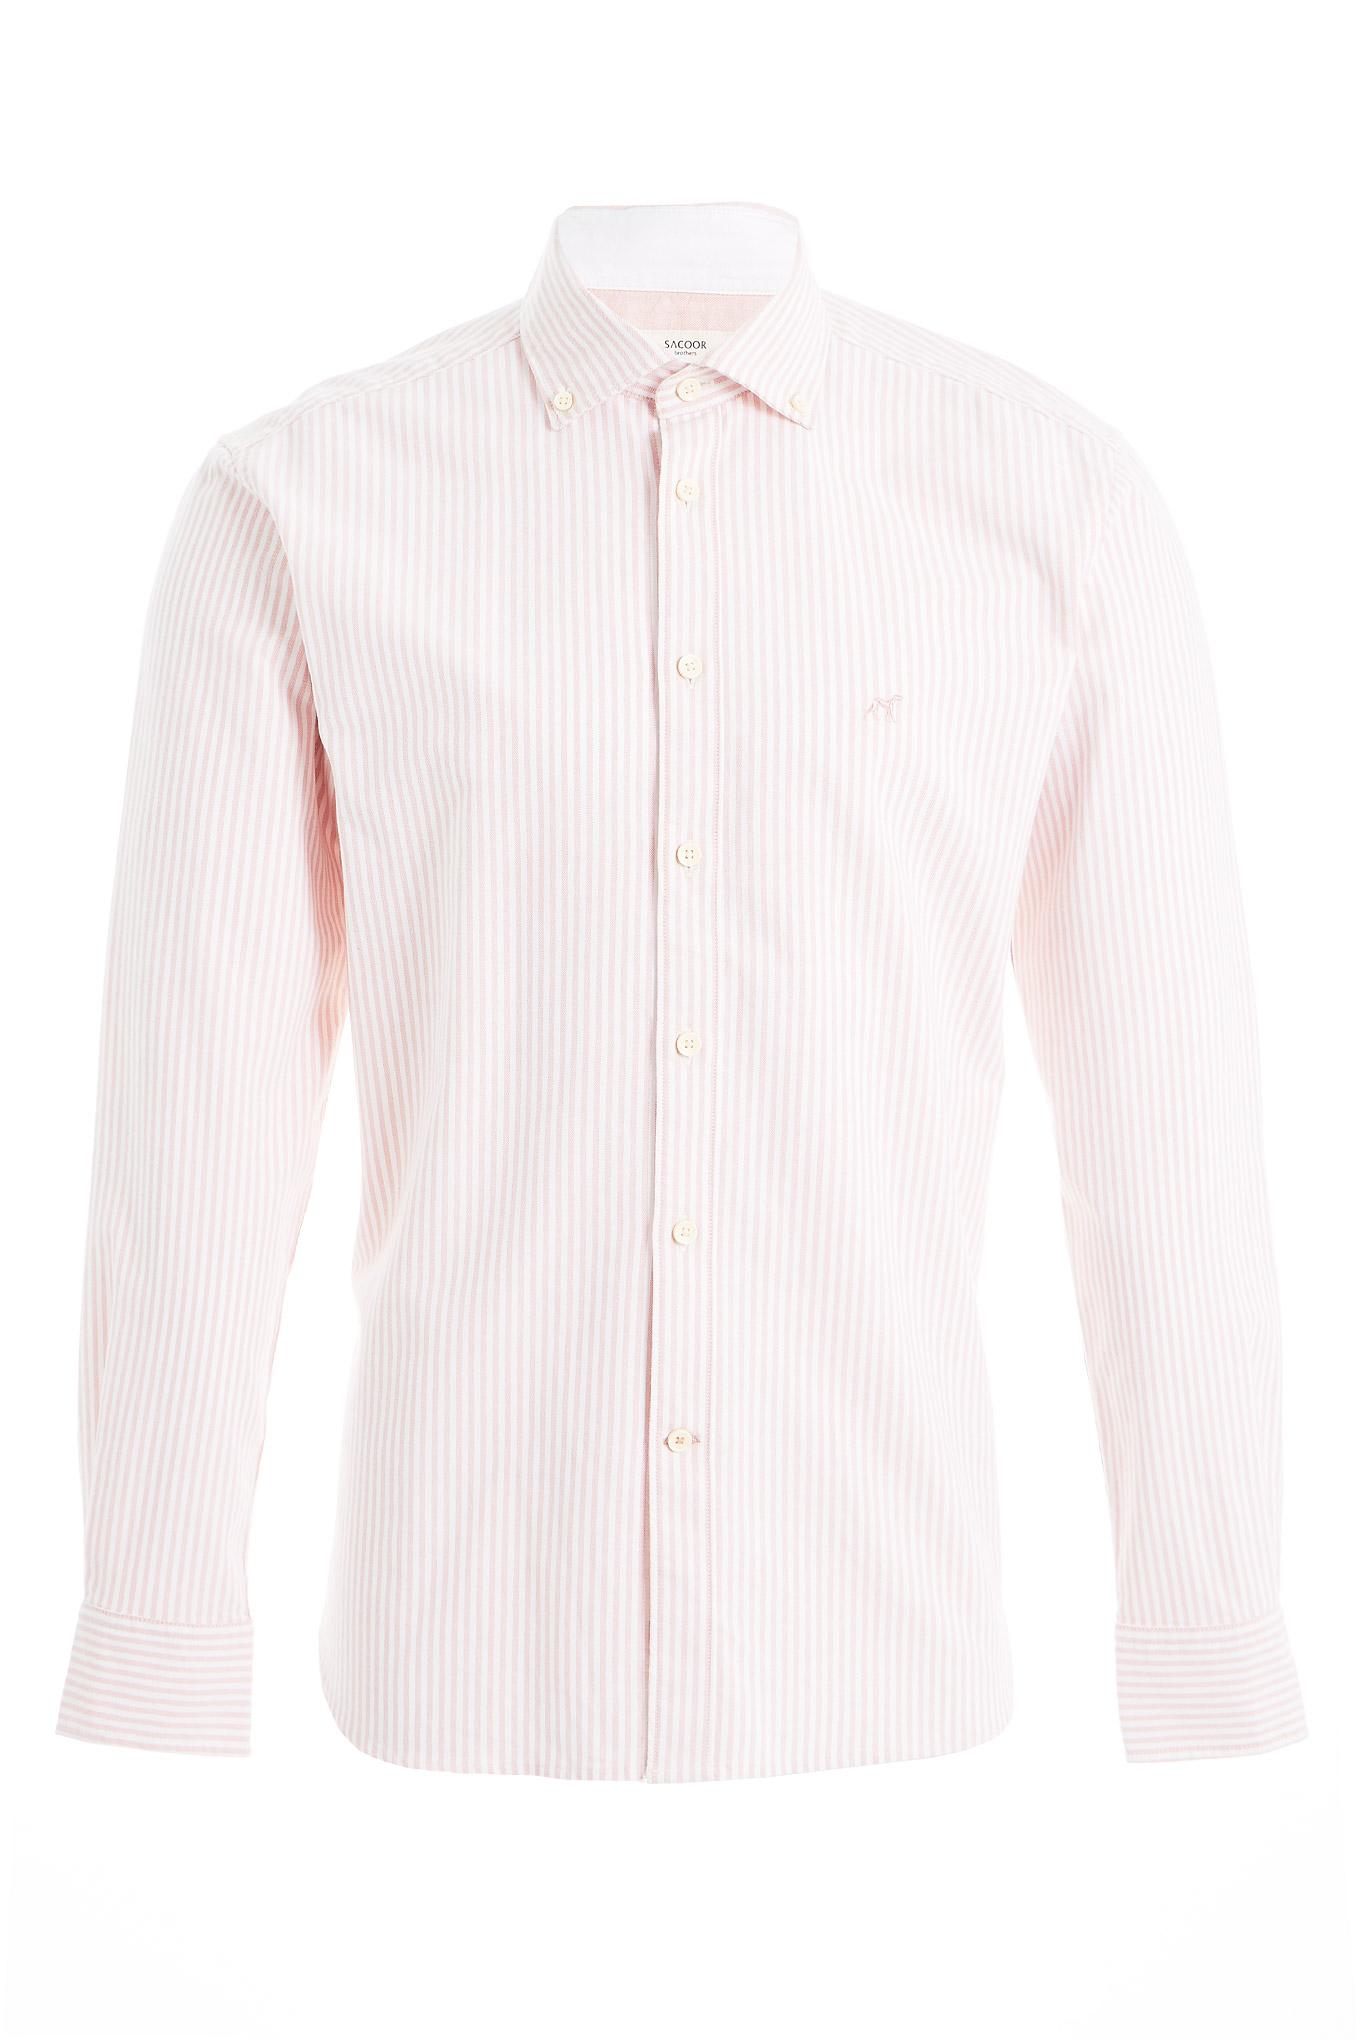 Shirt Pale Pink Sport Man